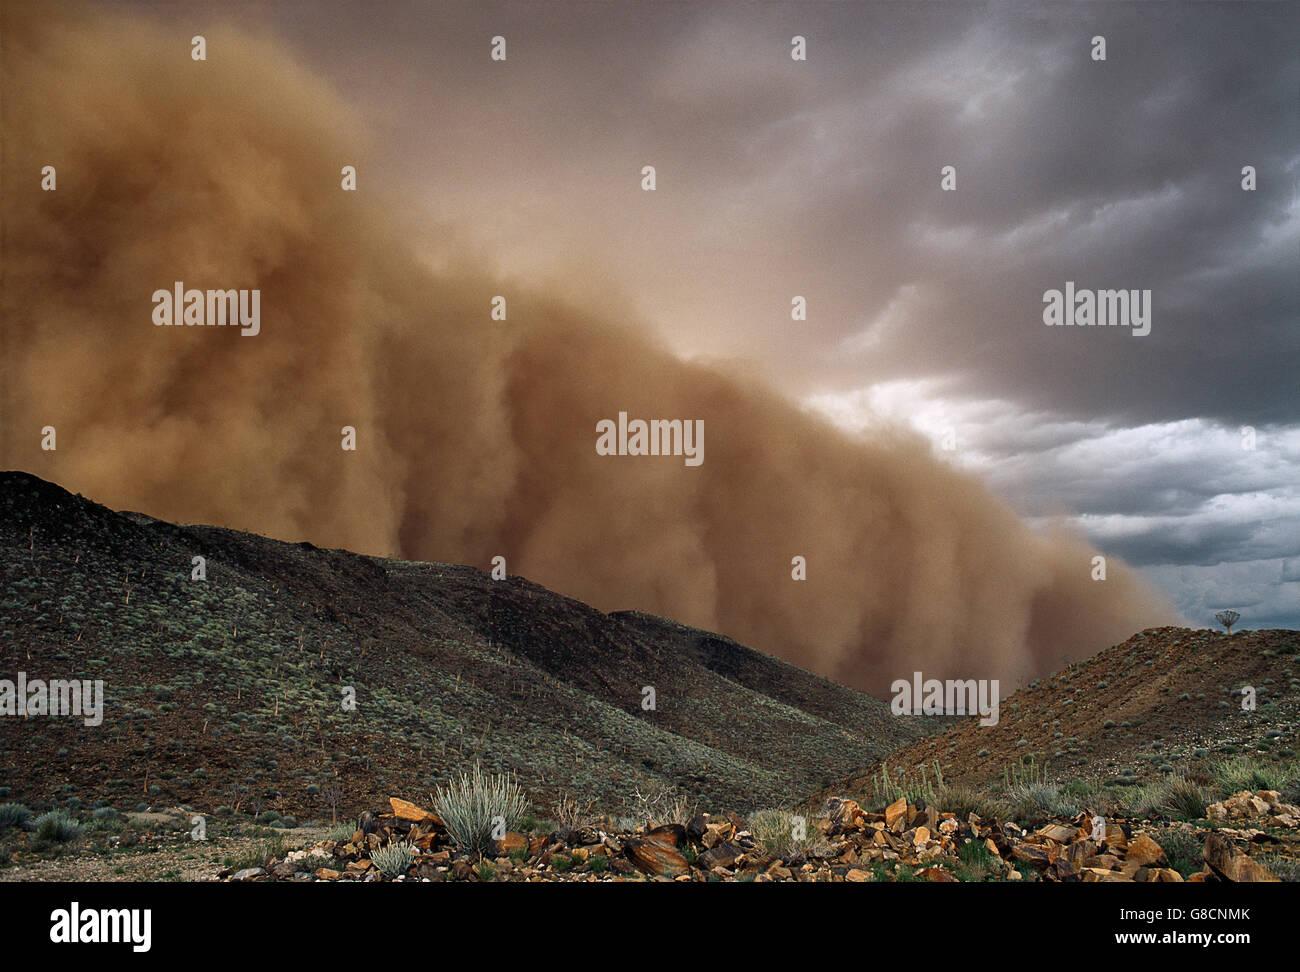 Tormenta de arena, el desierto de Namib, en Namibia. Imagen De Stock